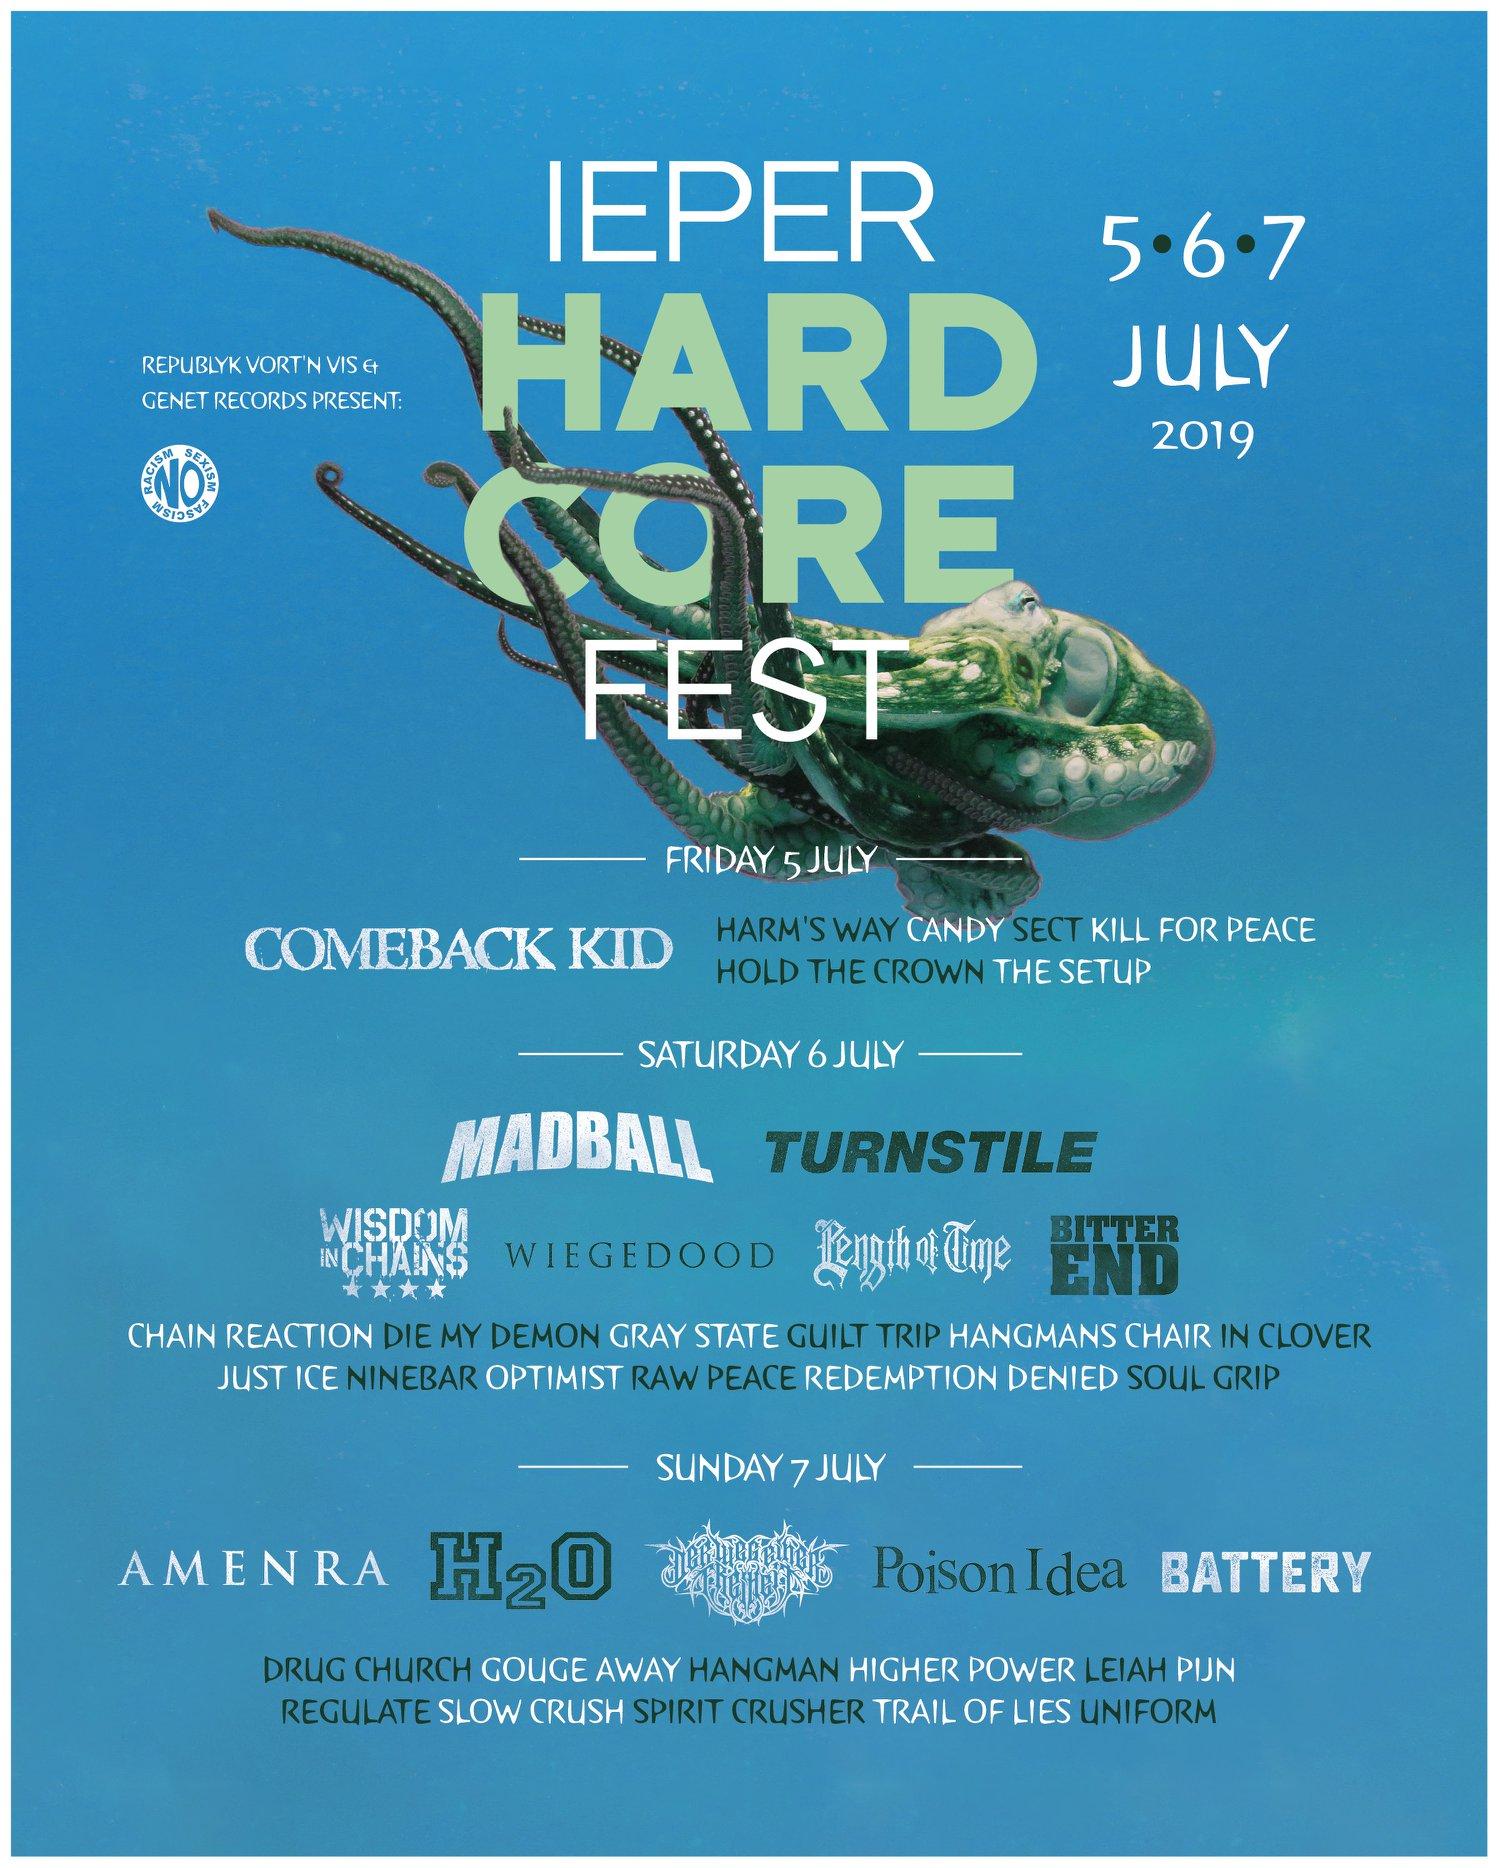 Ieper Hardcore Fest 2019